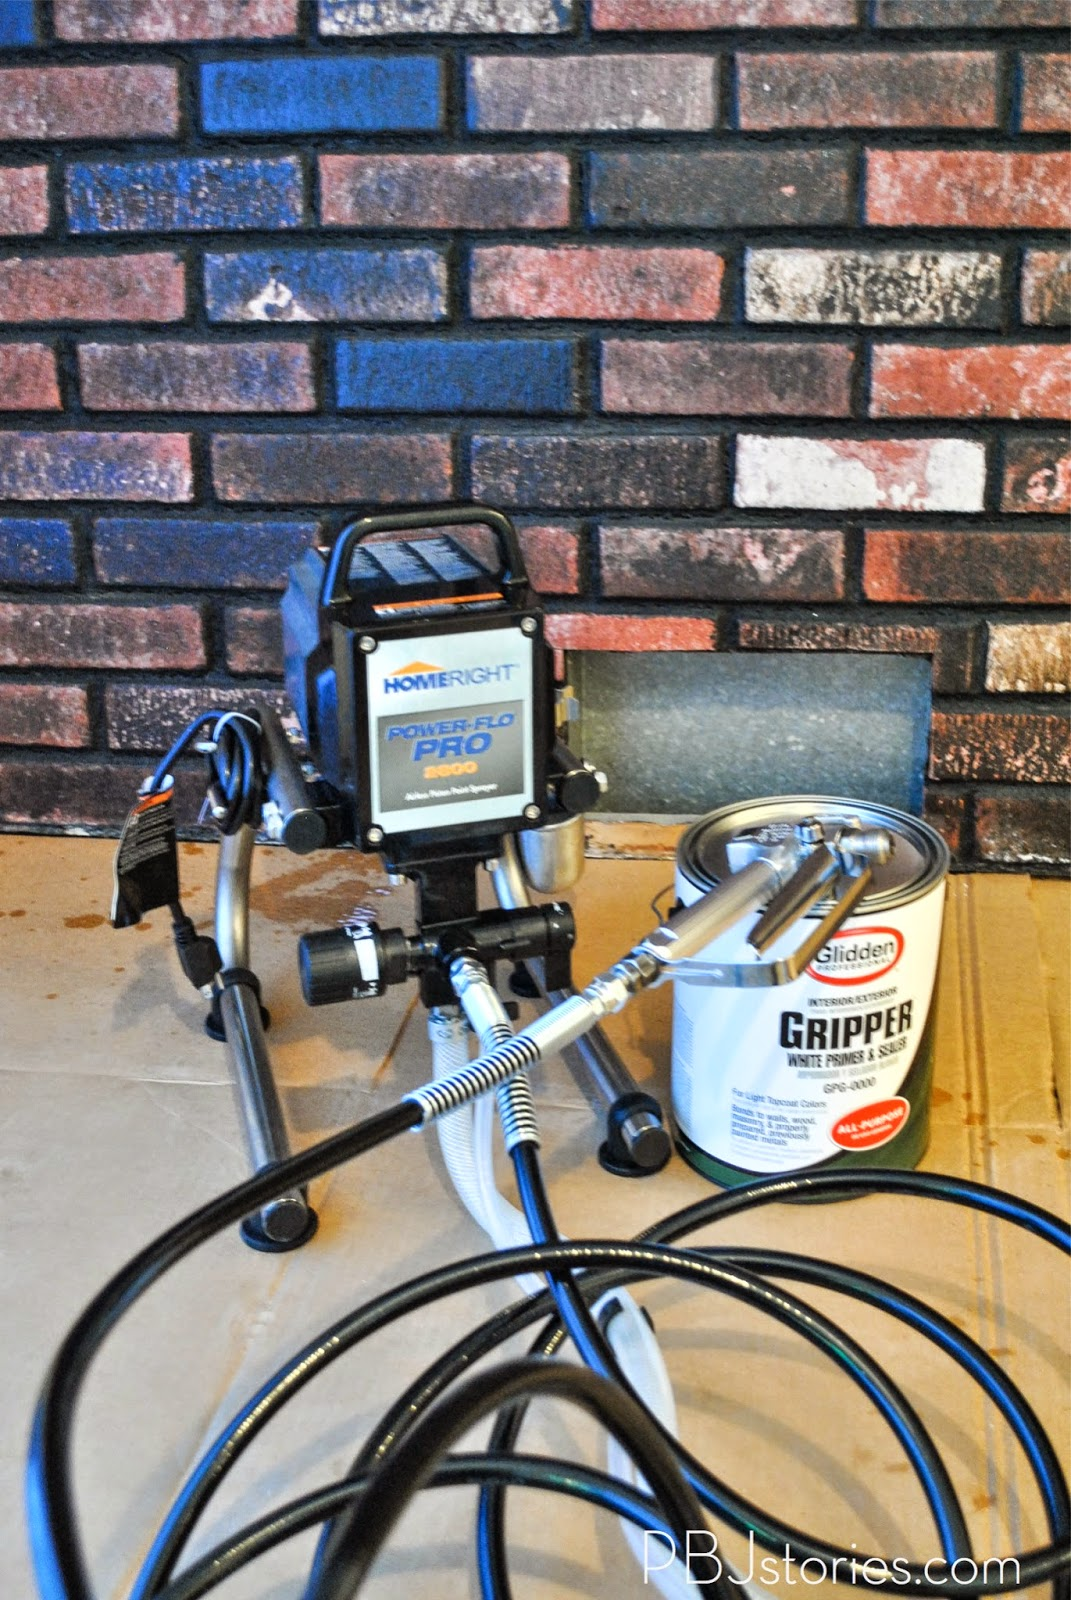 pbjstories how to paint an interior brick wall pbjreno. Black Bedroom Furniture Sets. Home Design Ideas